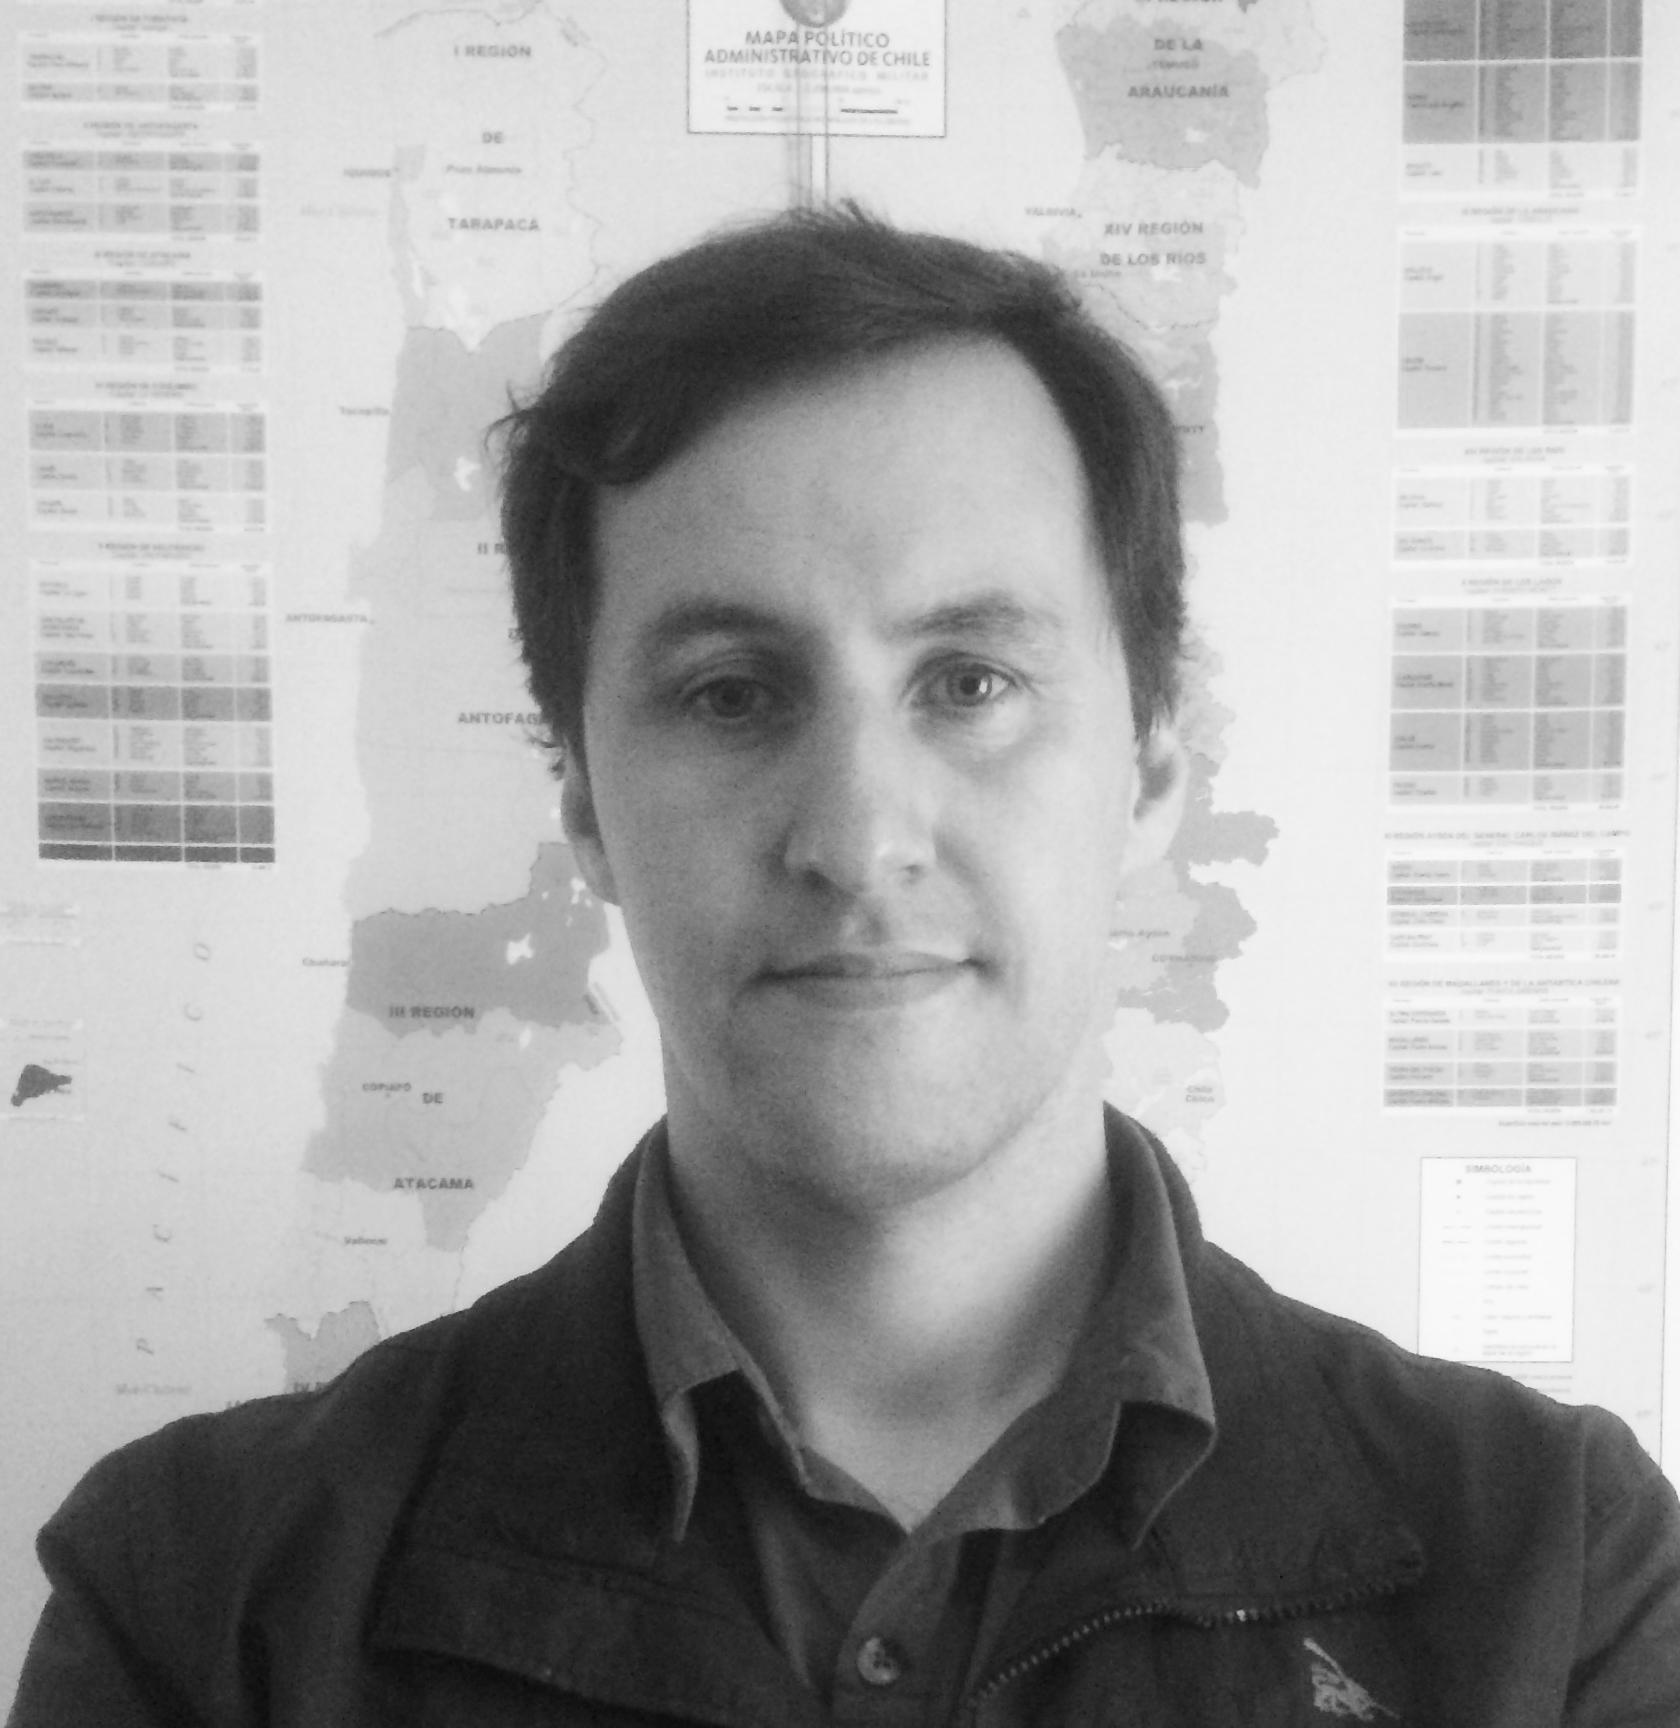 Sergio ahumada b495ea49 cf20 47ca bdf2 16033ea07eb2